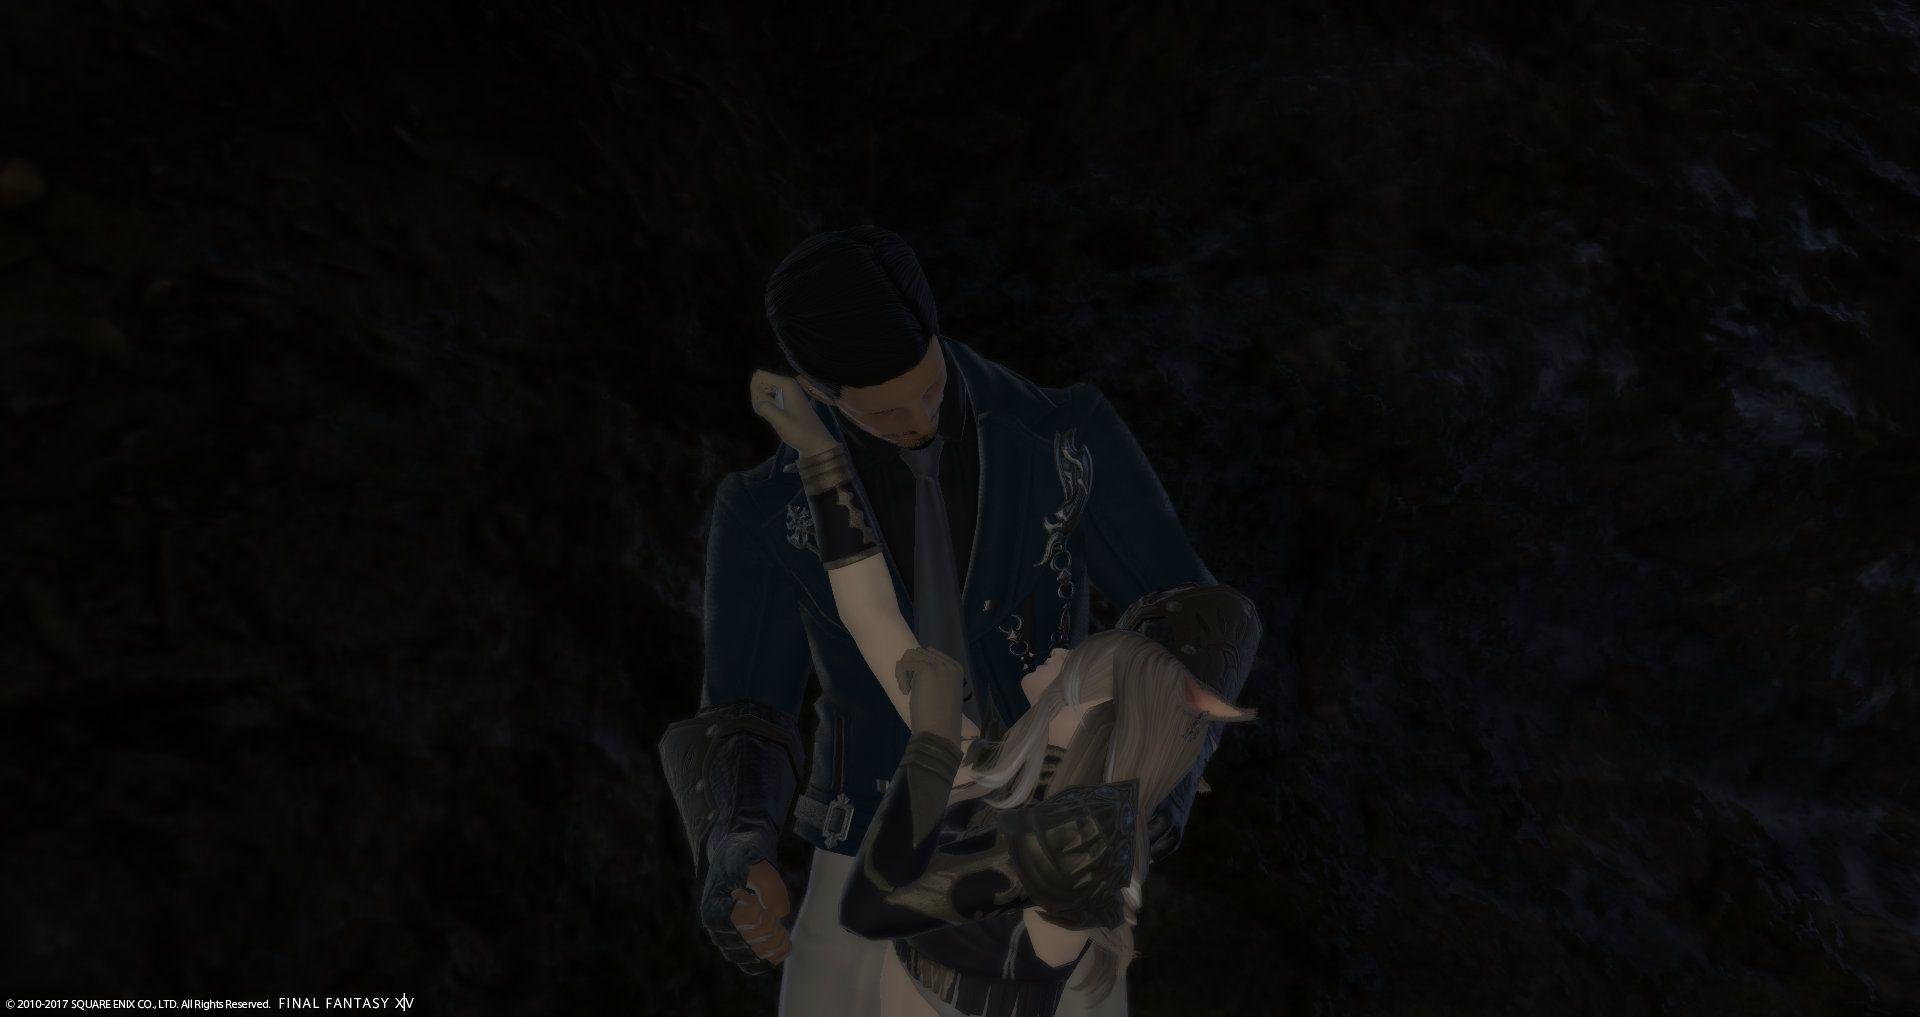 Echoes of Eorzea: FFXIV Screenshot Tutorial - Group Pose